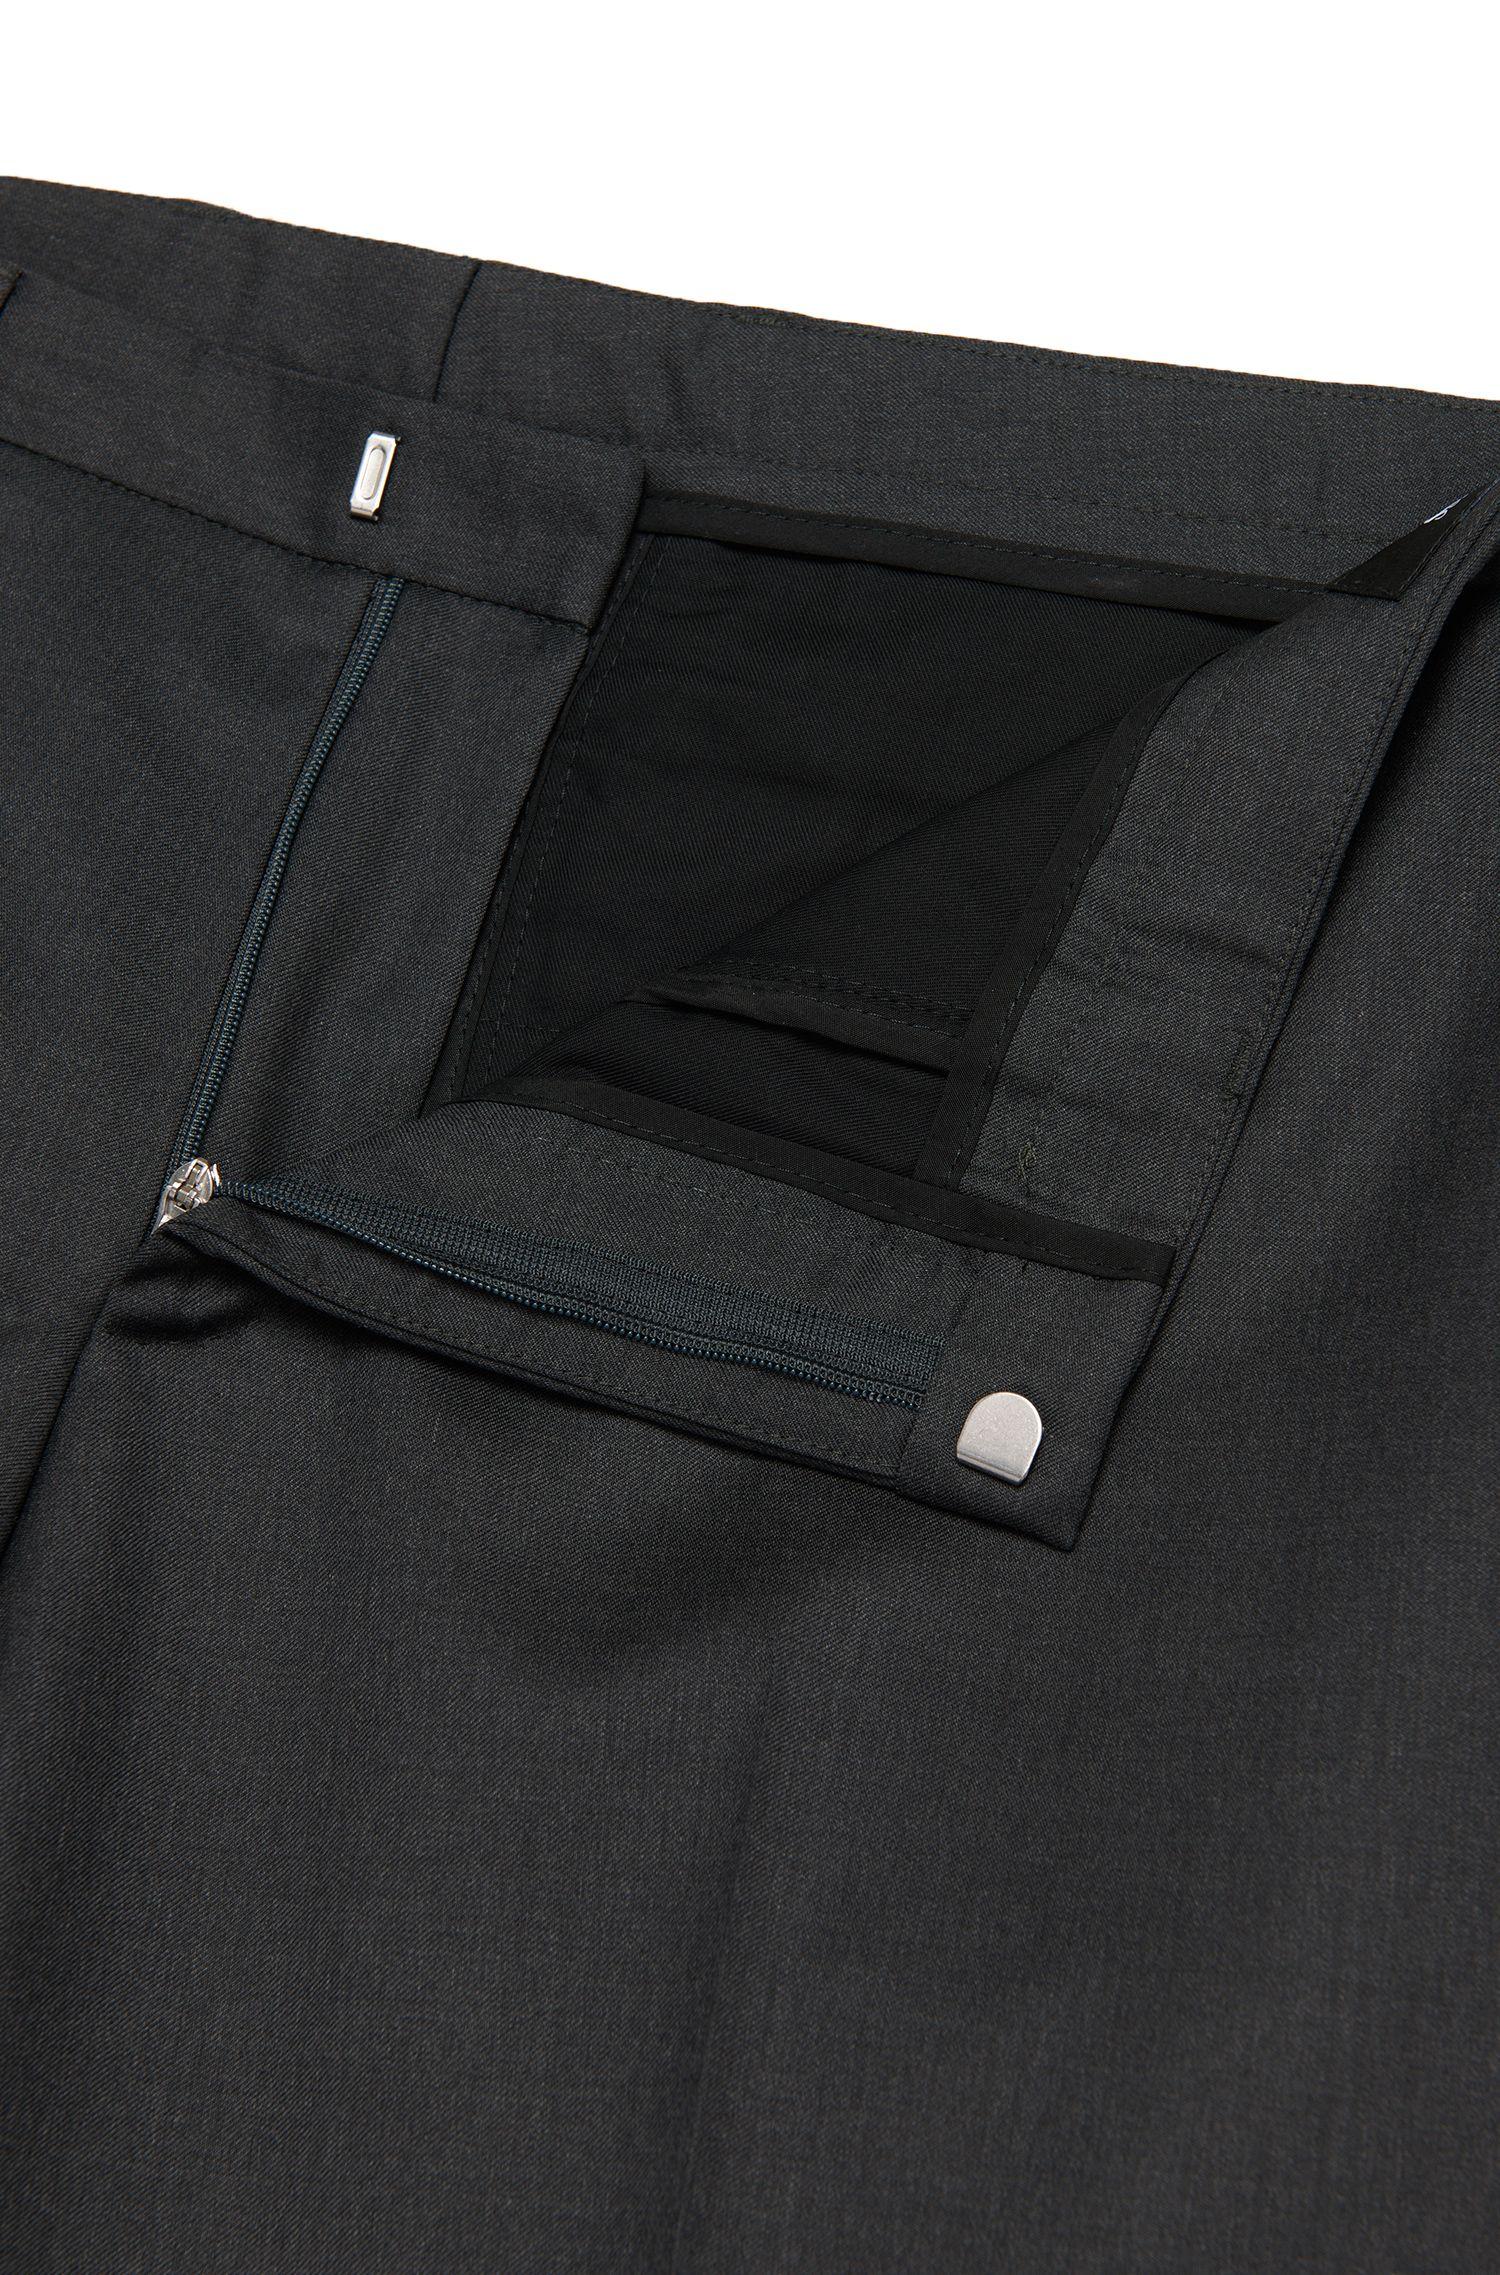 Virgin Wool Dress Pant, Extra Slim Fit | Wave CYL, Dark Grey